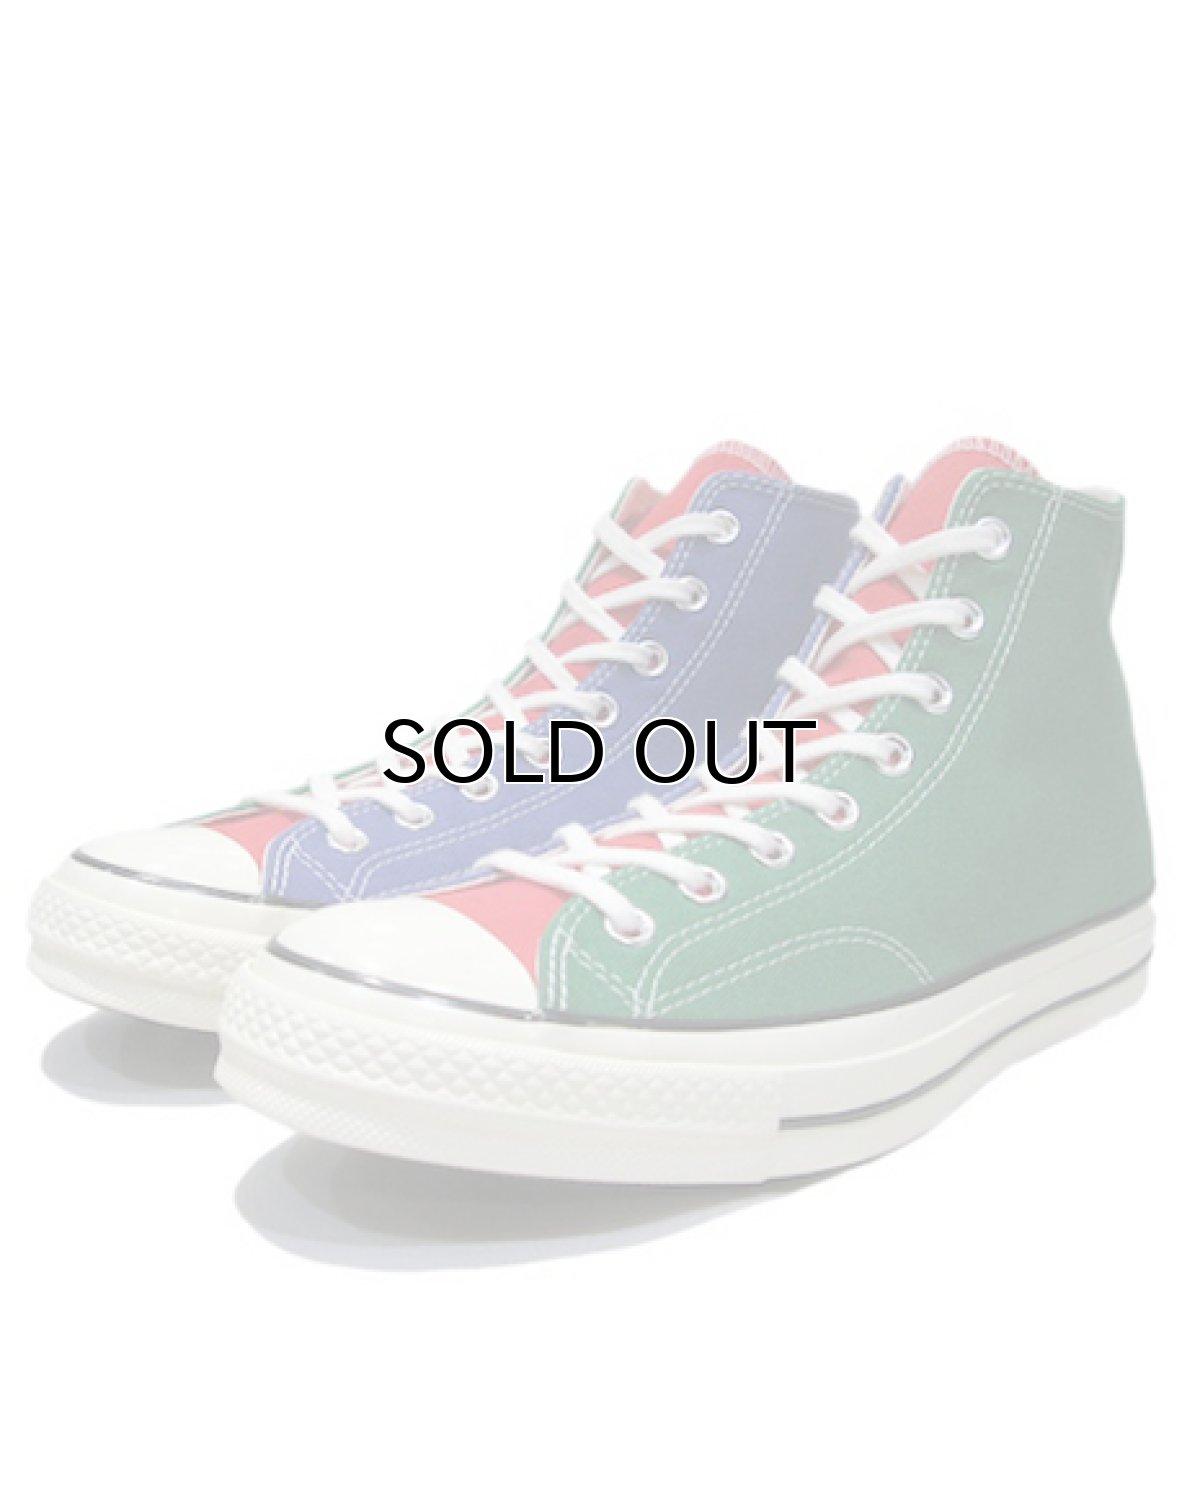 "画像1: NEW Converse ""Chuck Tailor Premium"" Hi-Cut Canvas Sneaker Crazy Pattern size 11 (29.5 cm) (1)"